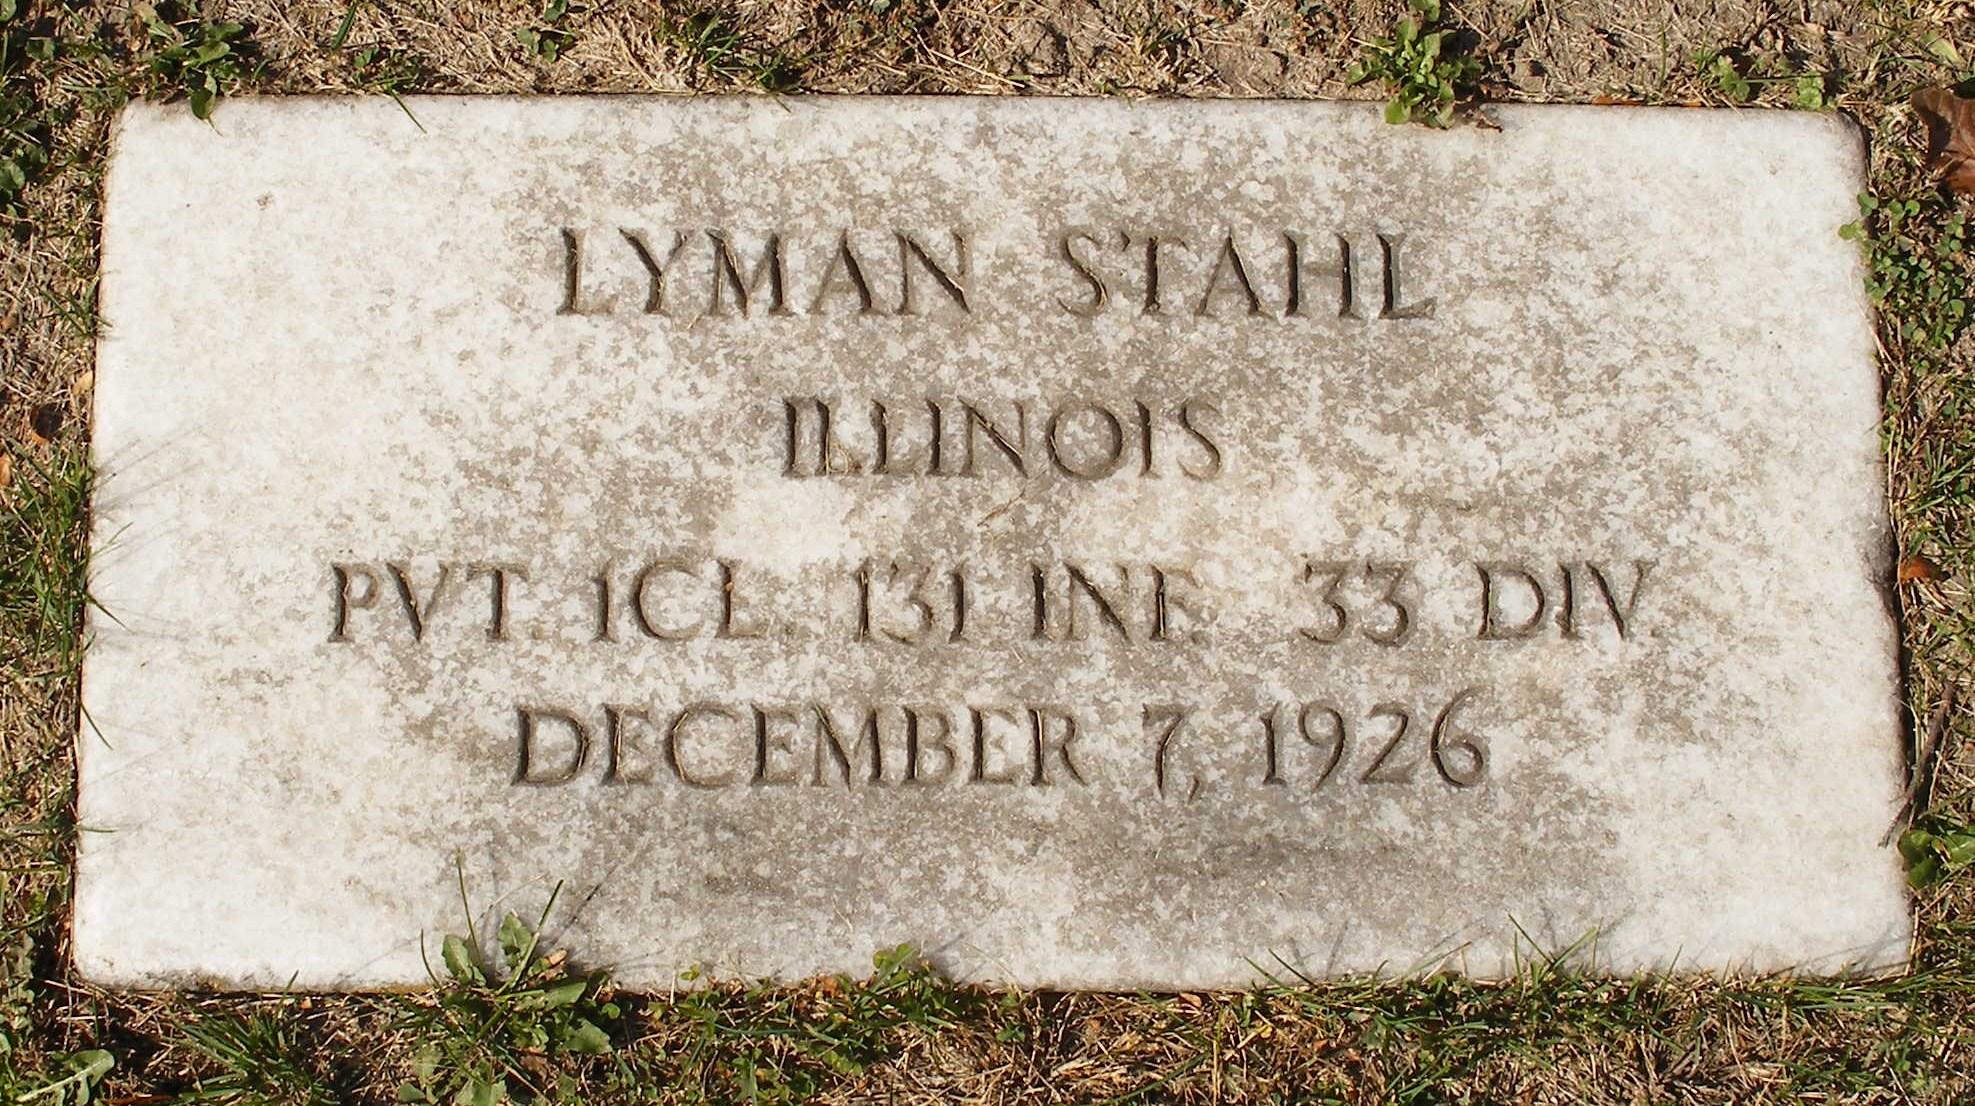 Policeman Lyman James Stahl   Melrose Park Police Department, Illinois